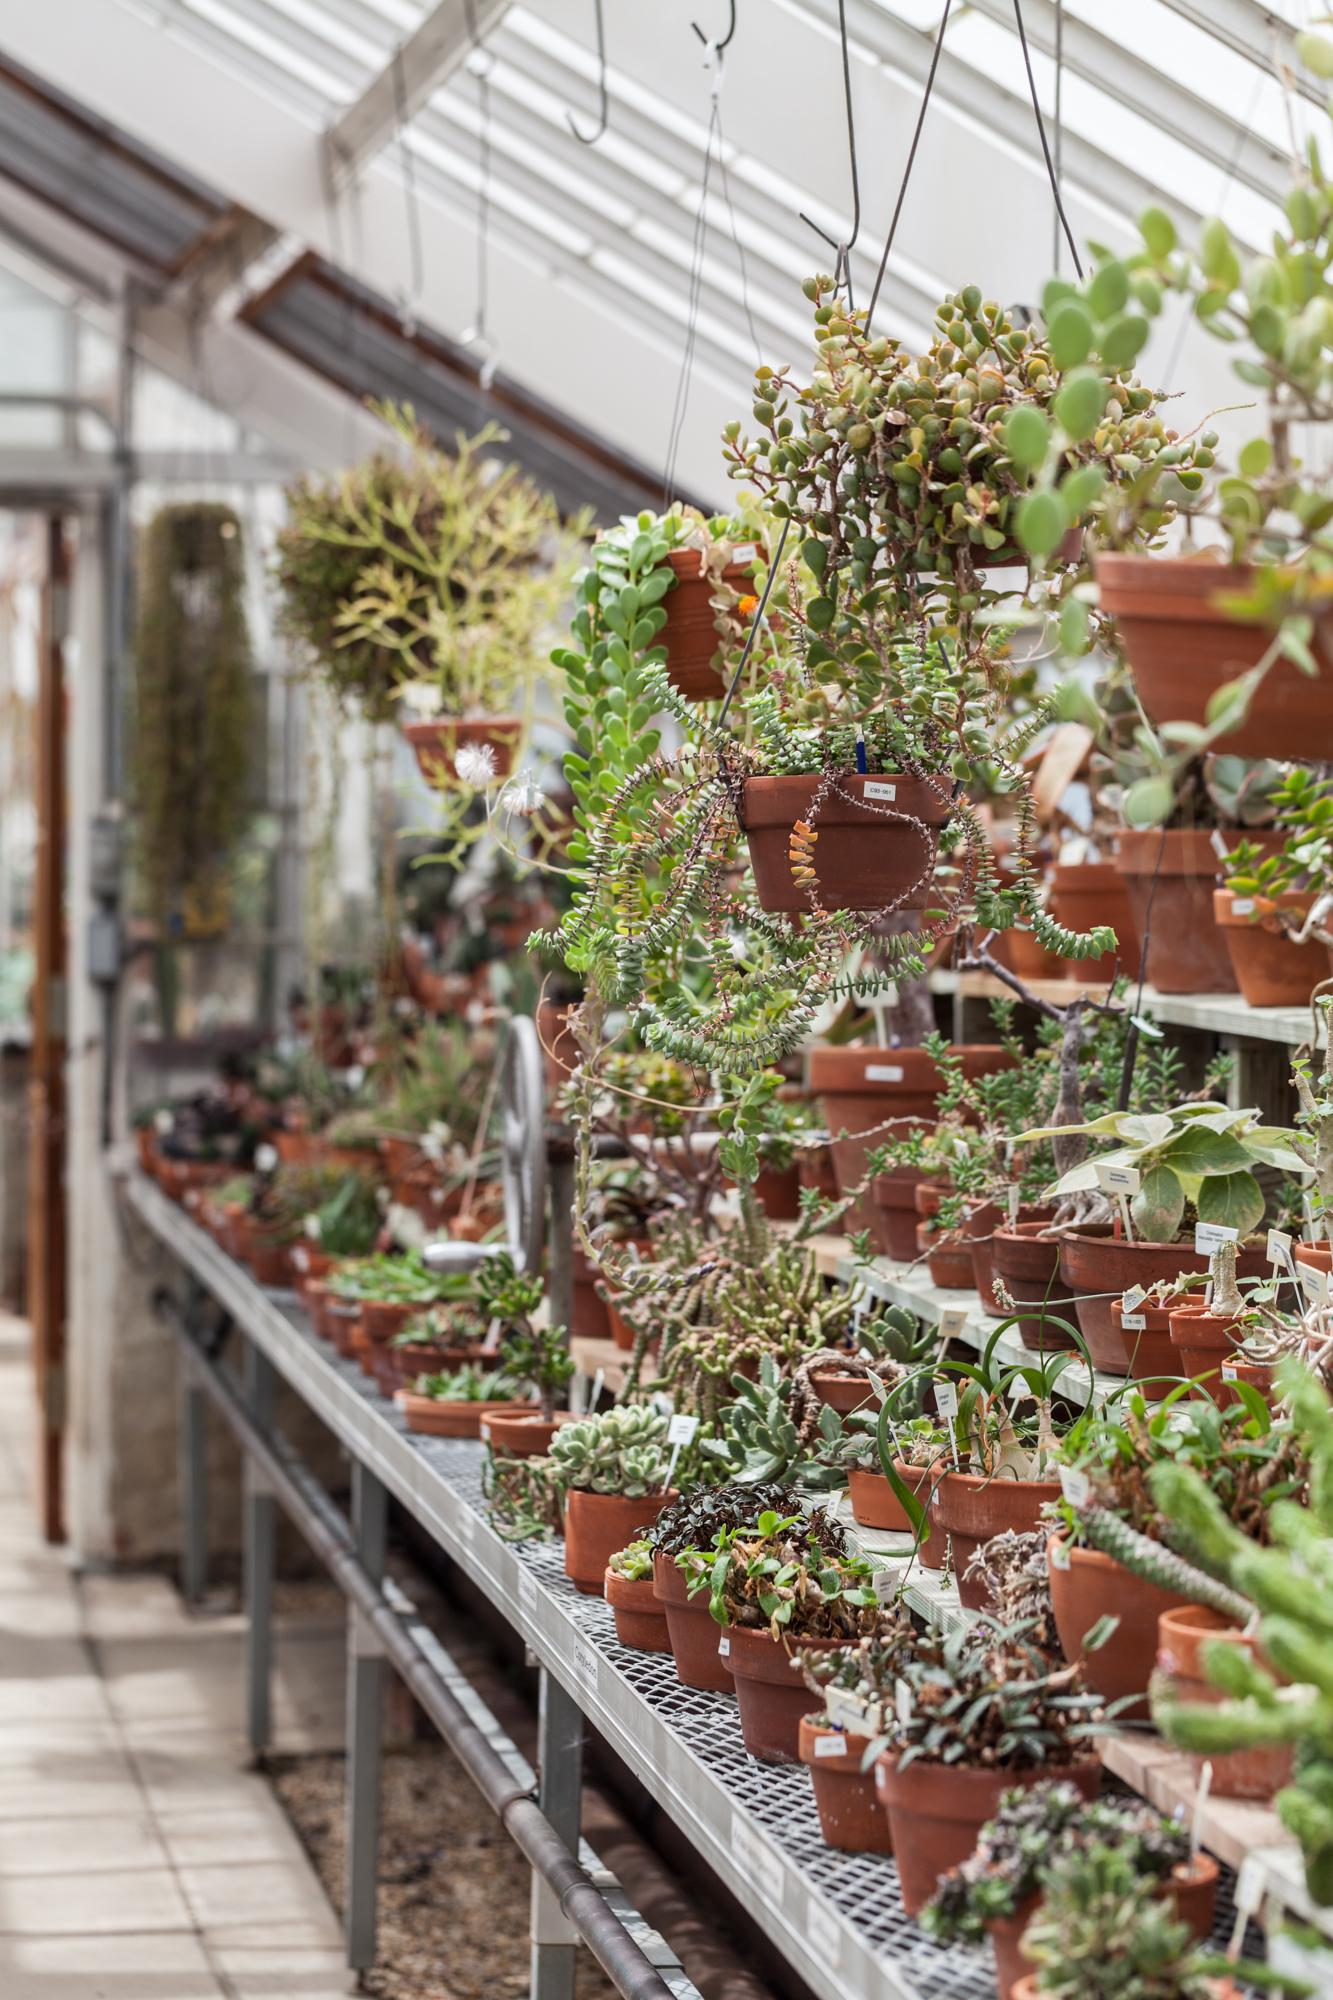 Planting-Fields-Greenhouse-Summer-Rayne-Oakes-Homestead-Brooklyn-succulents.jpg